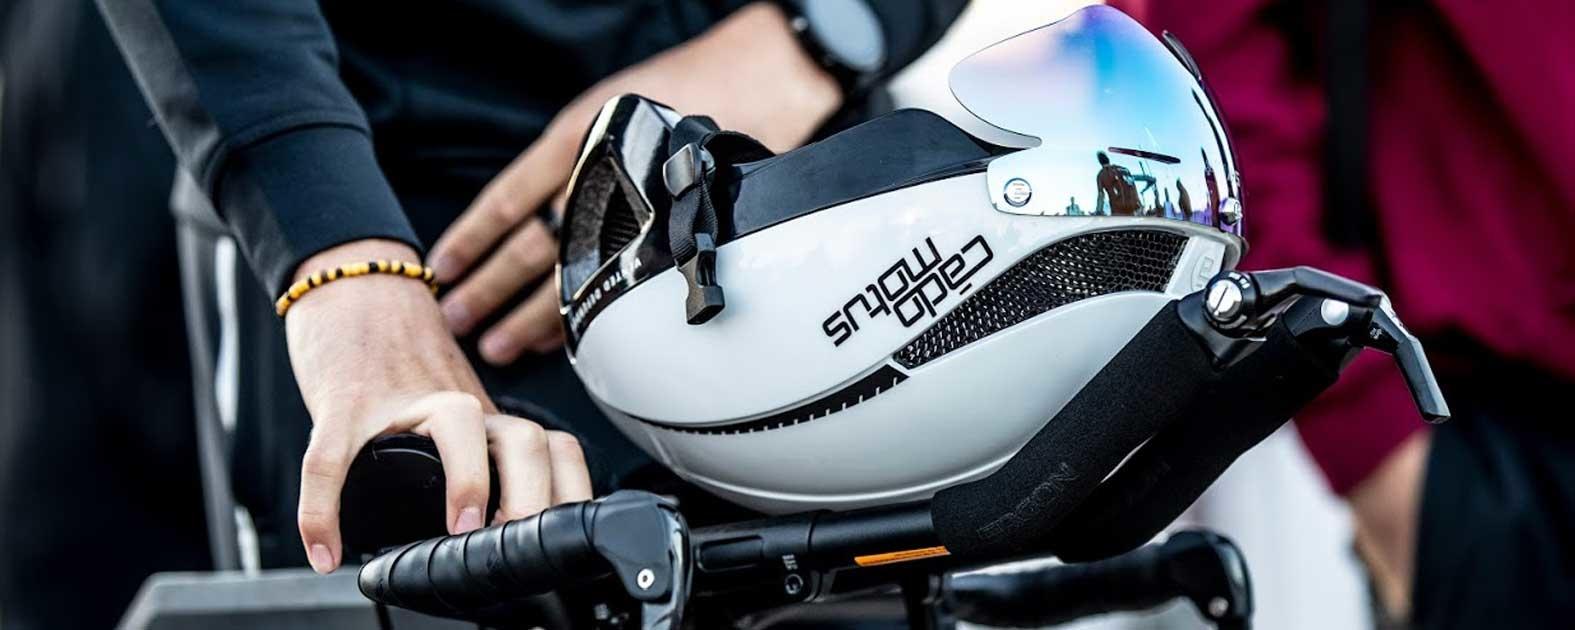 Cadomotus Triathlon helmet